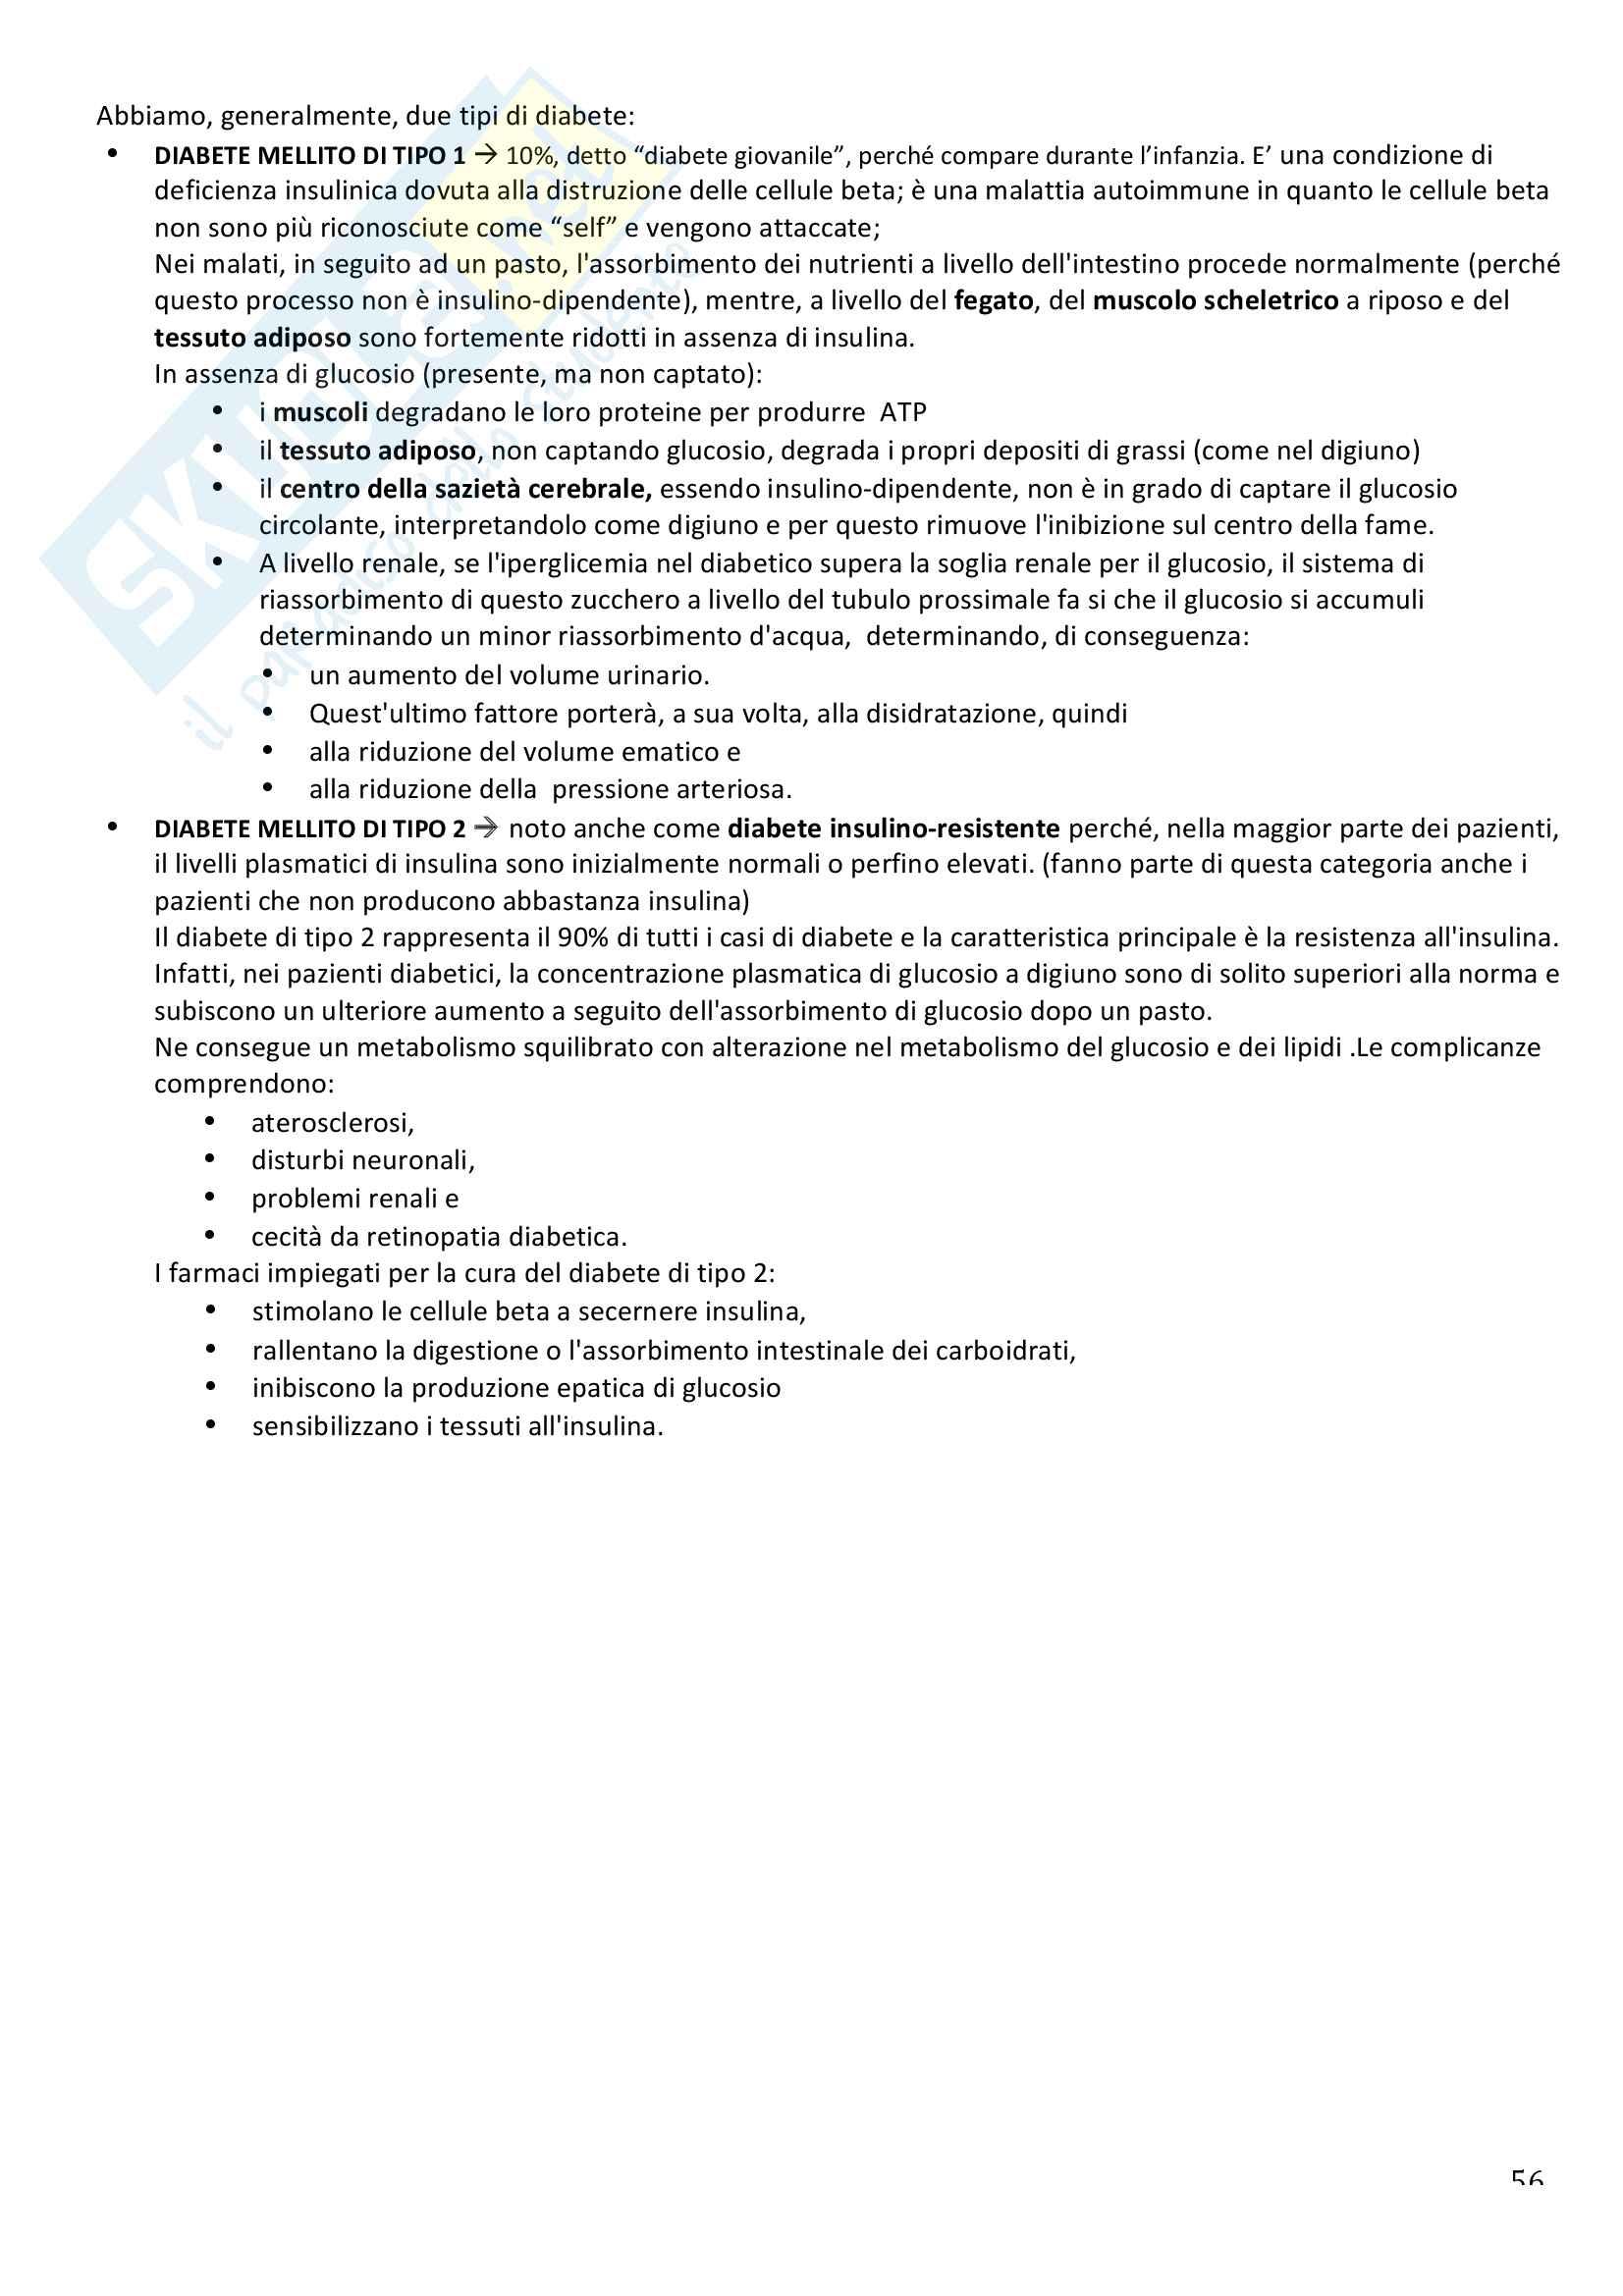 Appunti di fisiologia umana Pag. 56